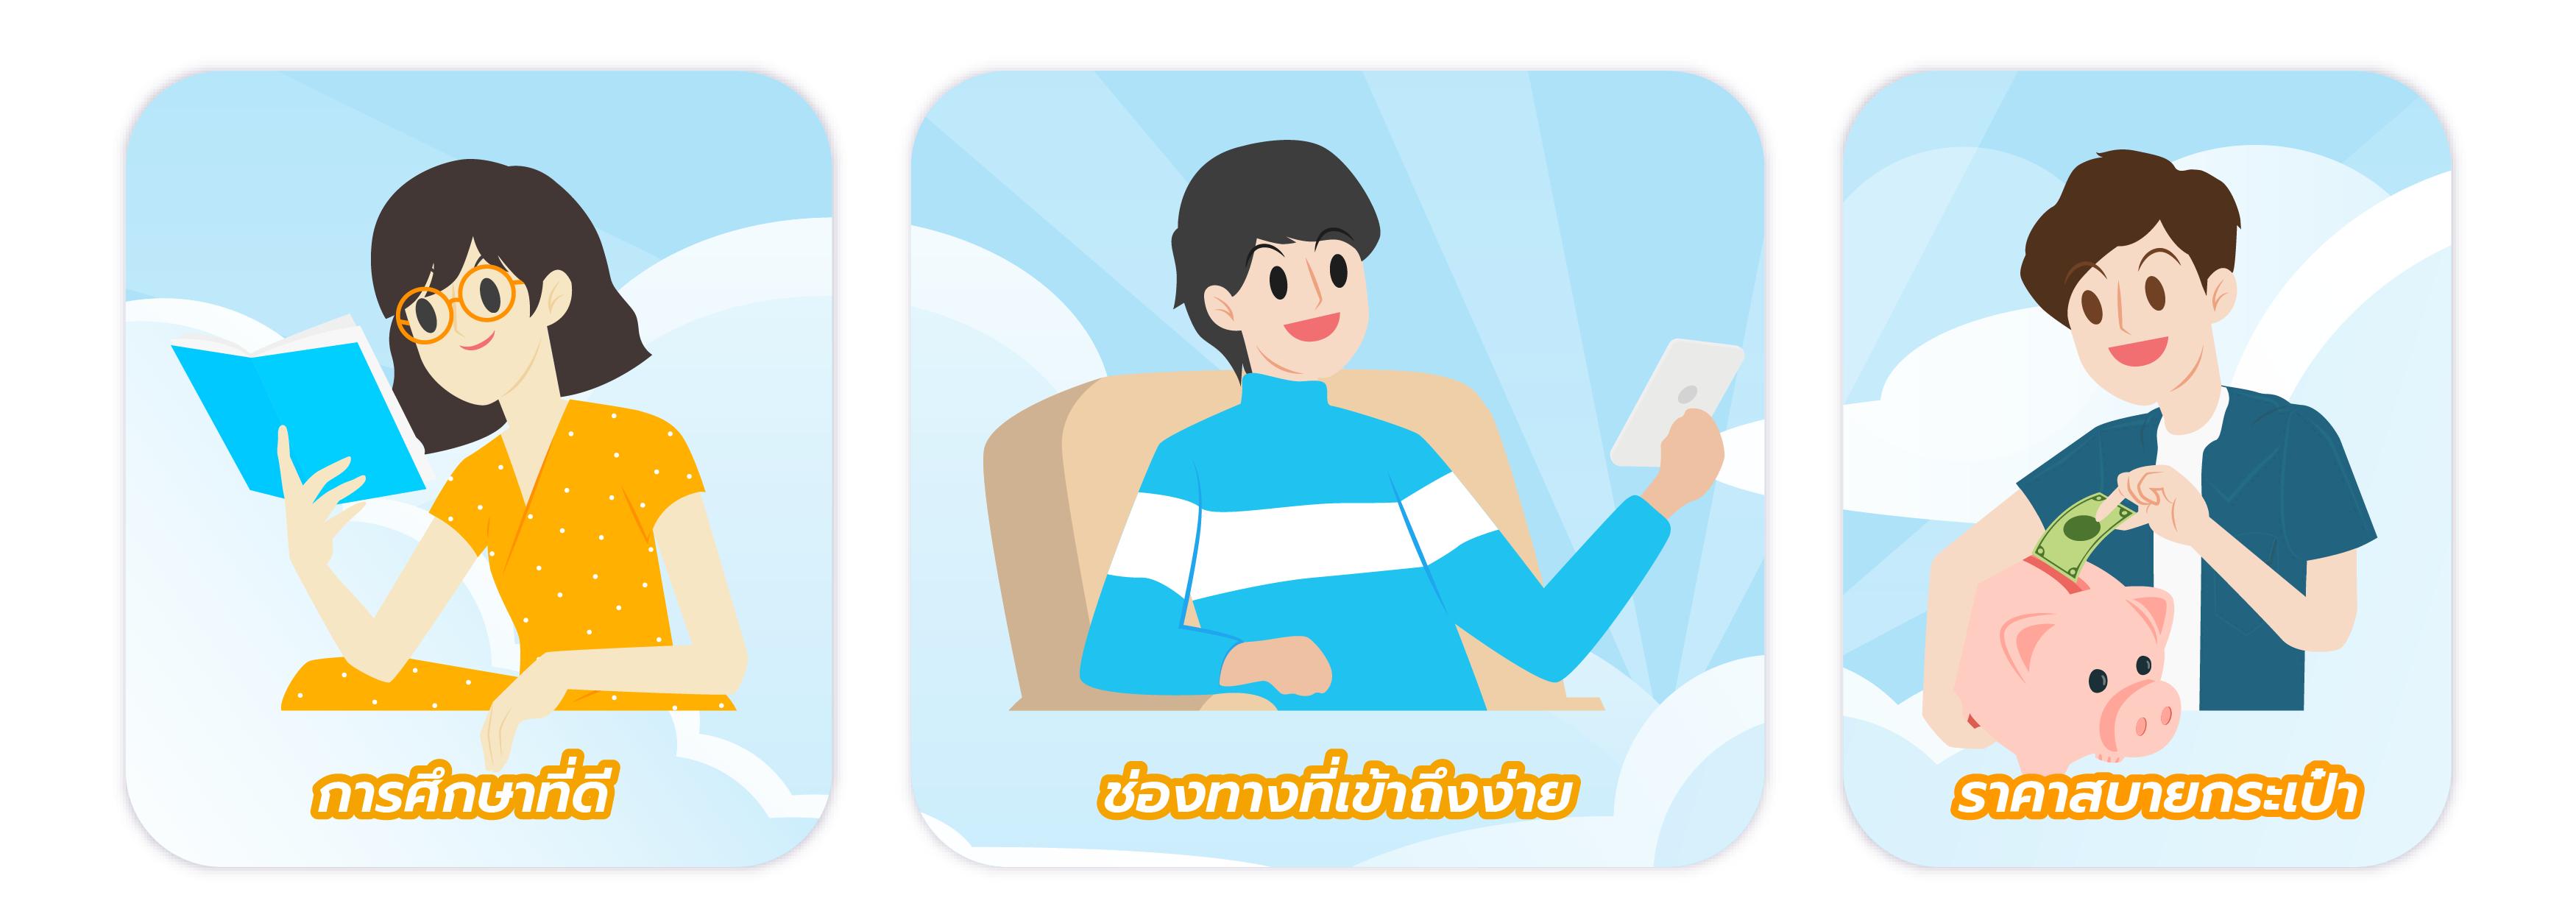 icon_mission_(840x300)_Draft04